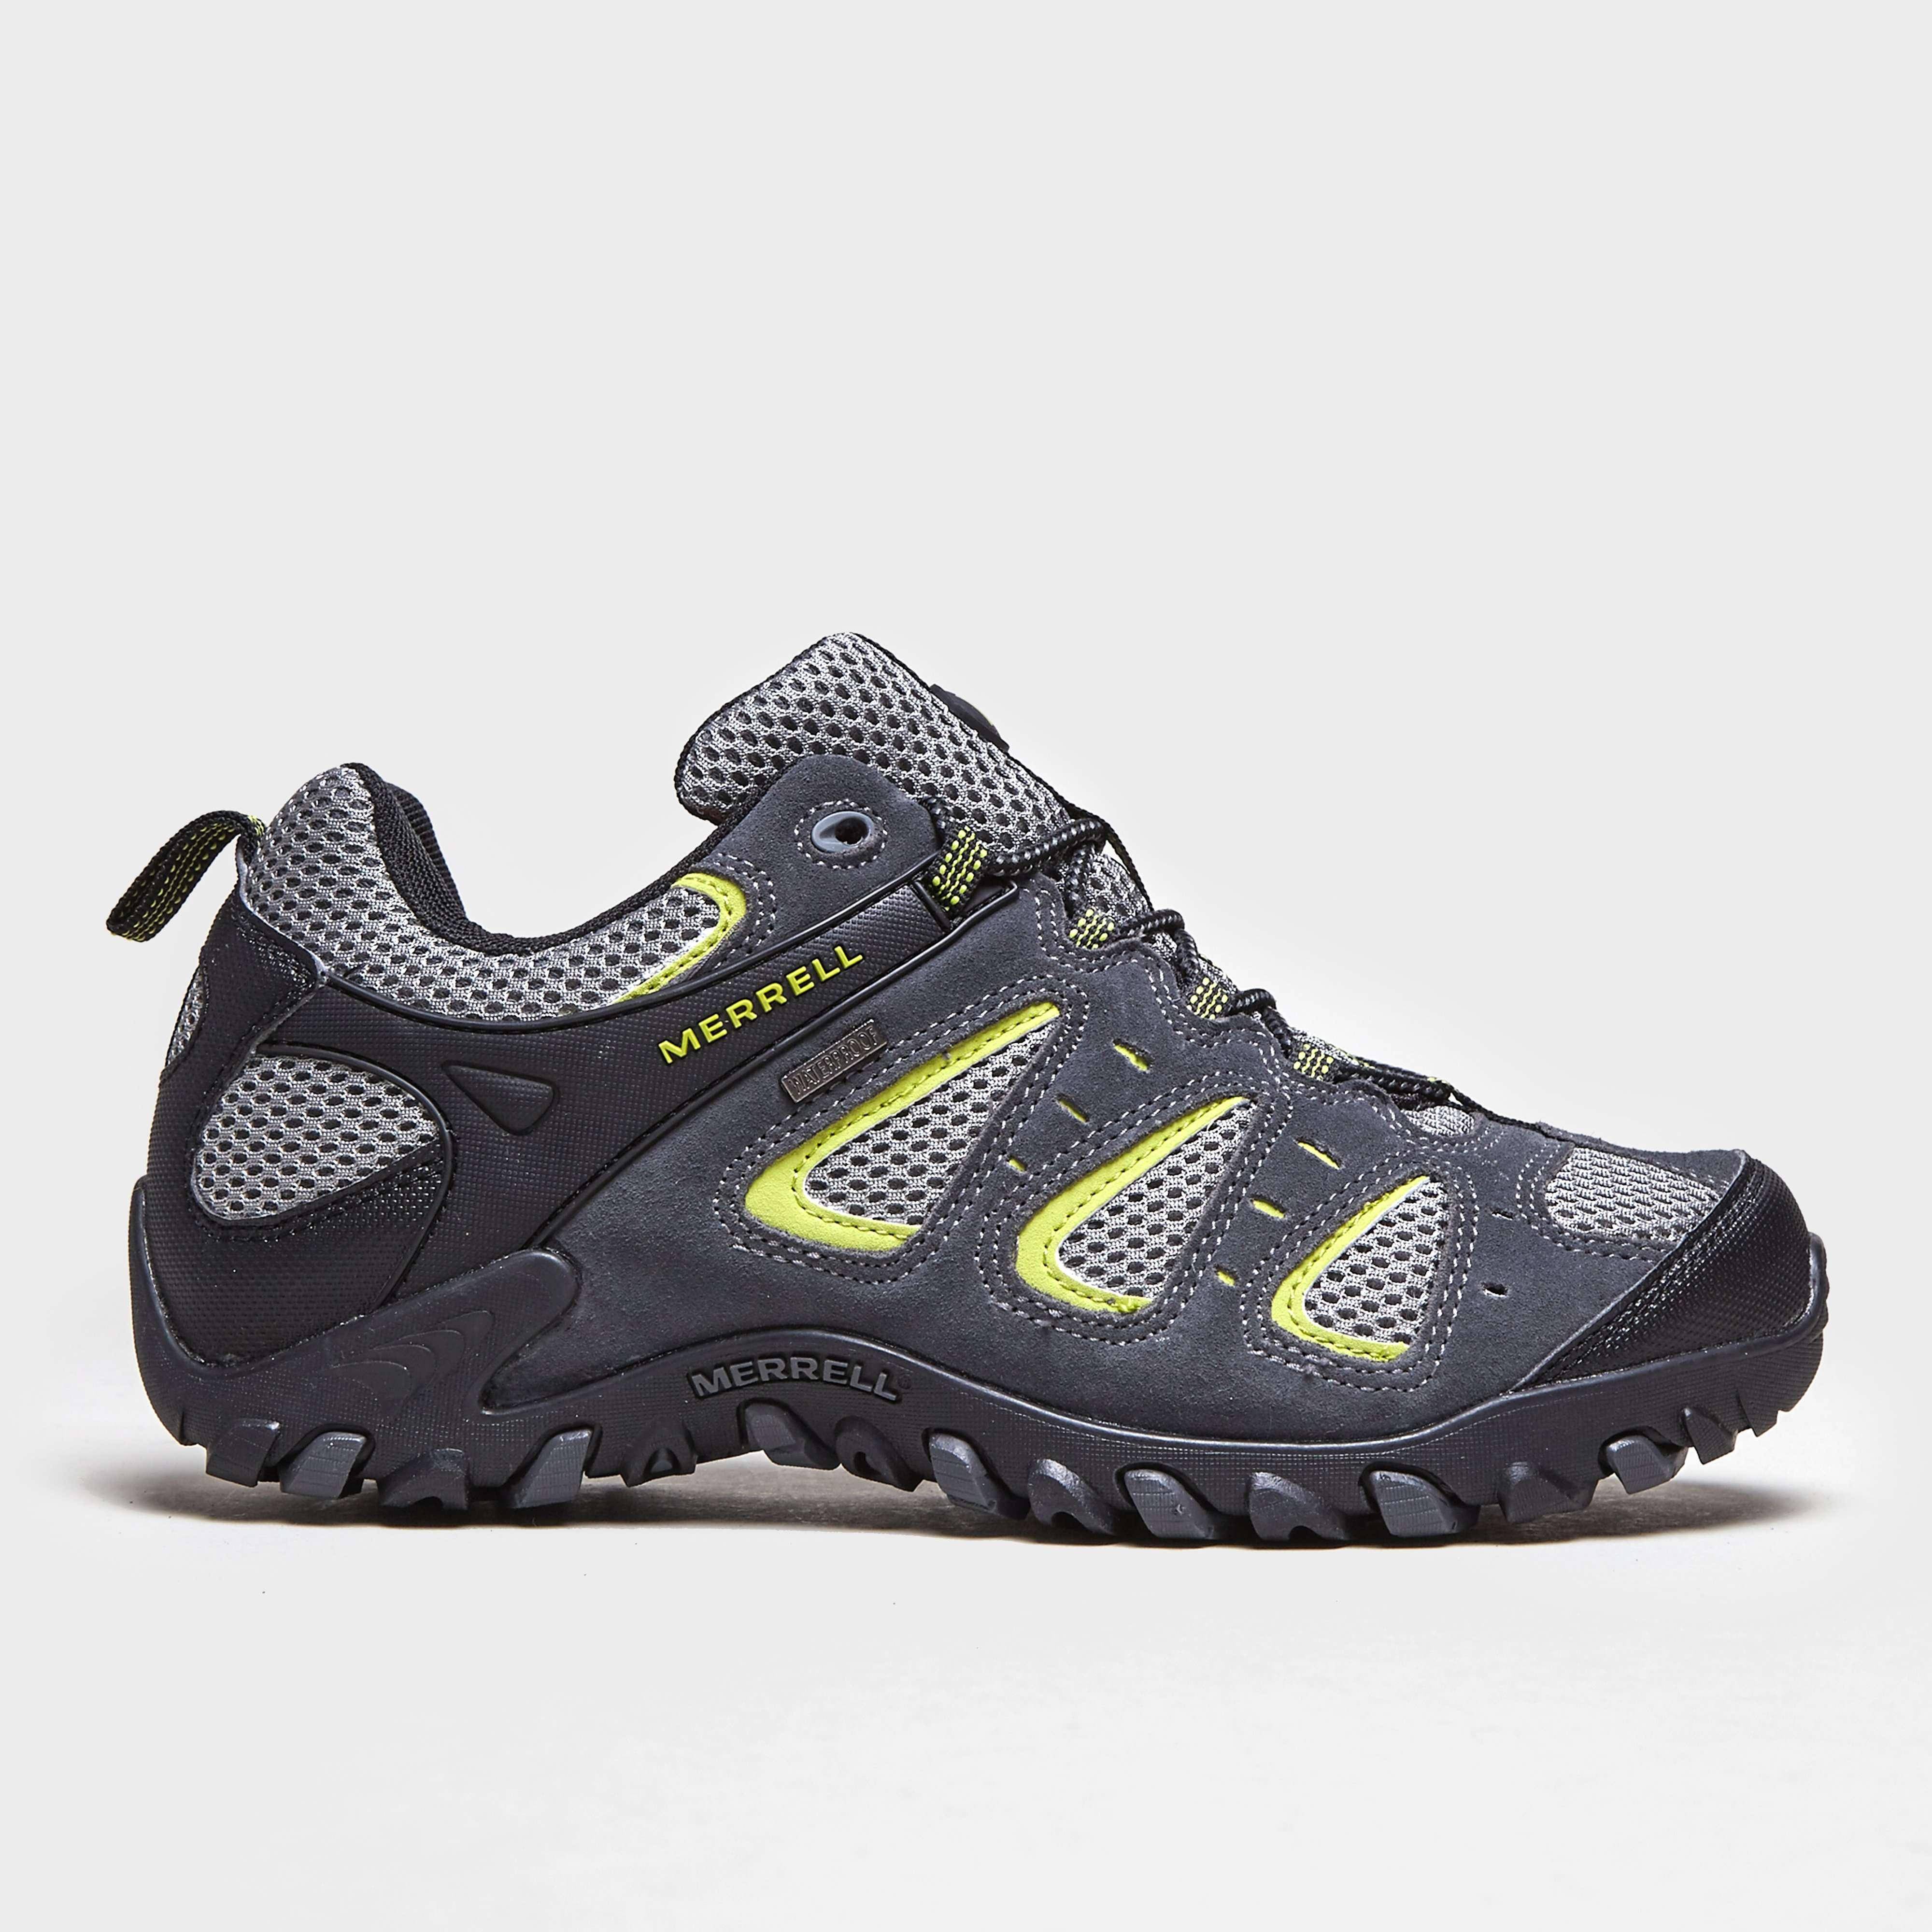 MERRELL Men's Highvale Waterproof Hiking Shoe